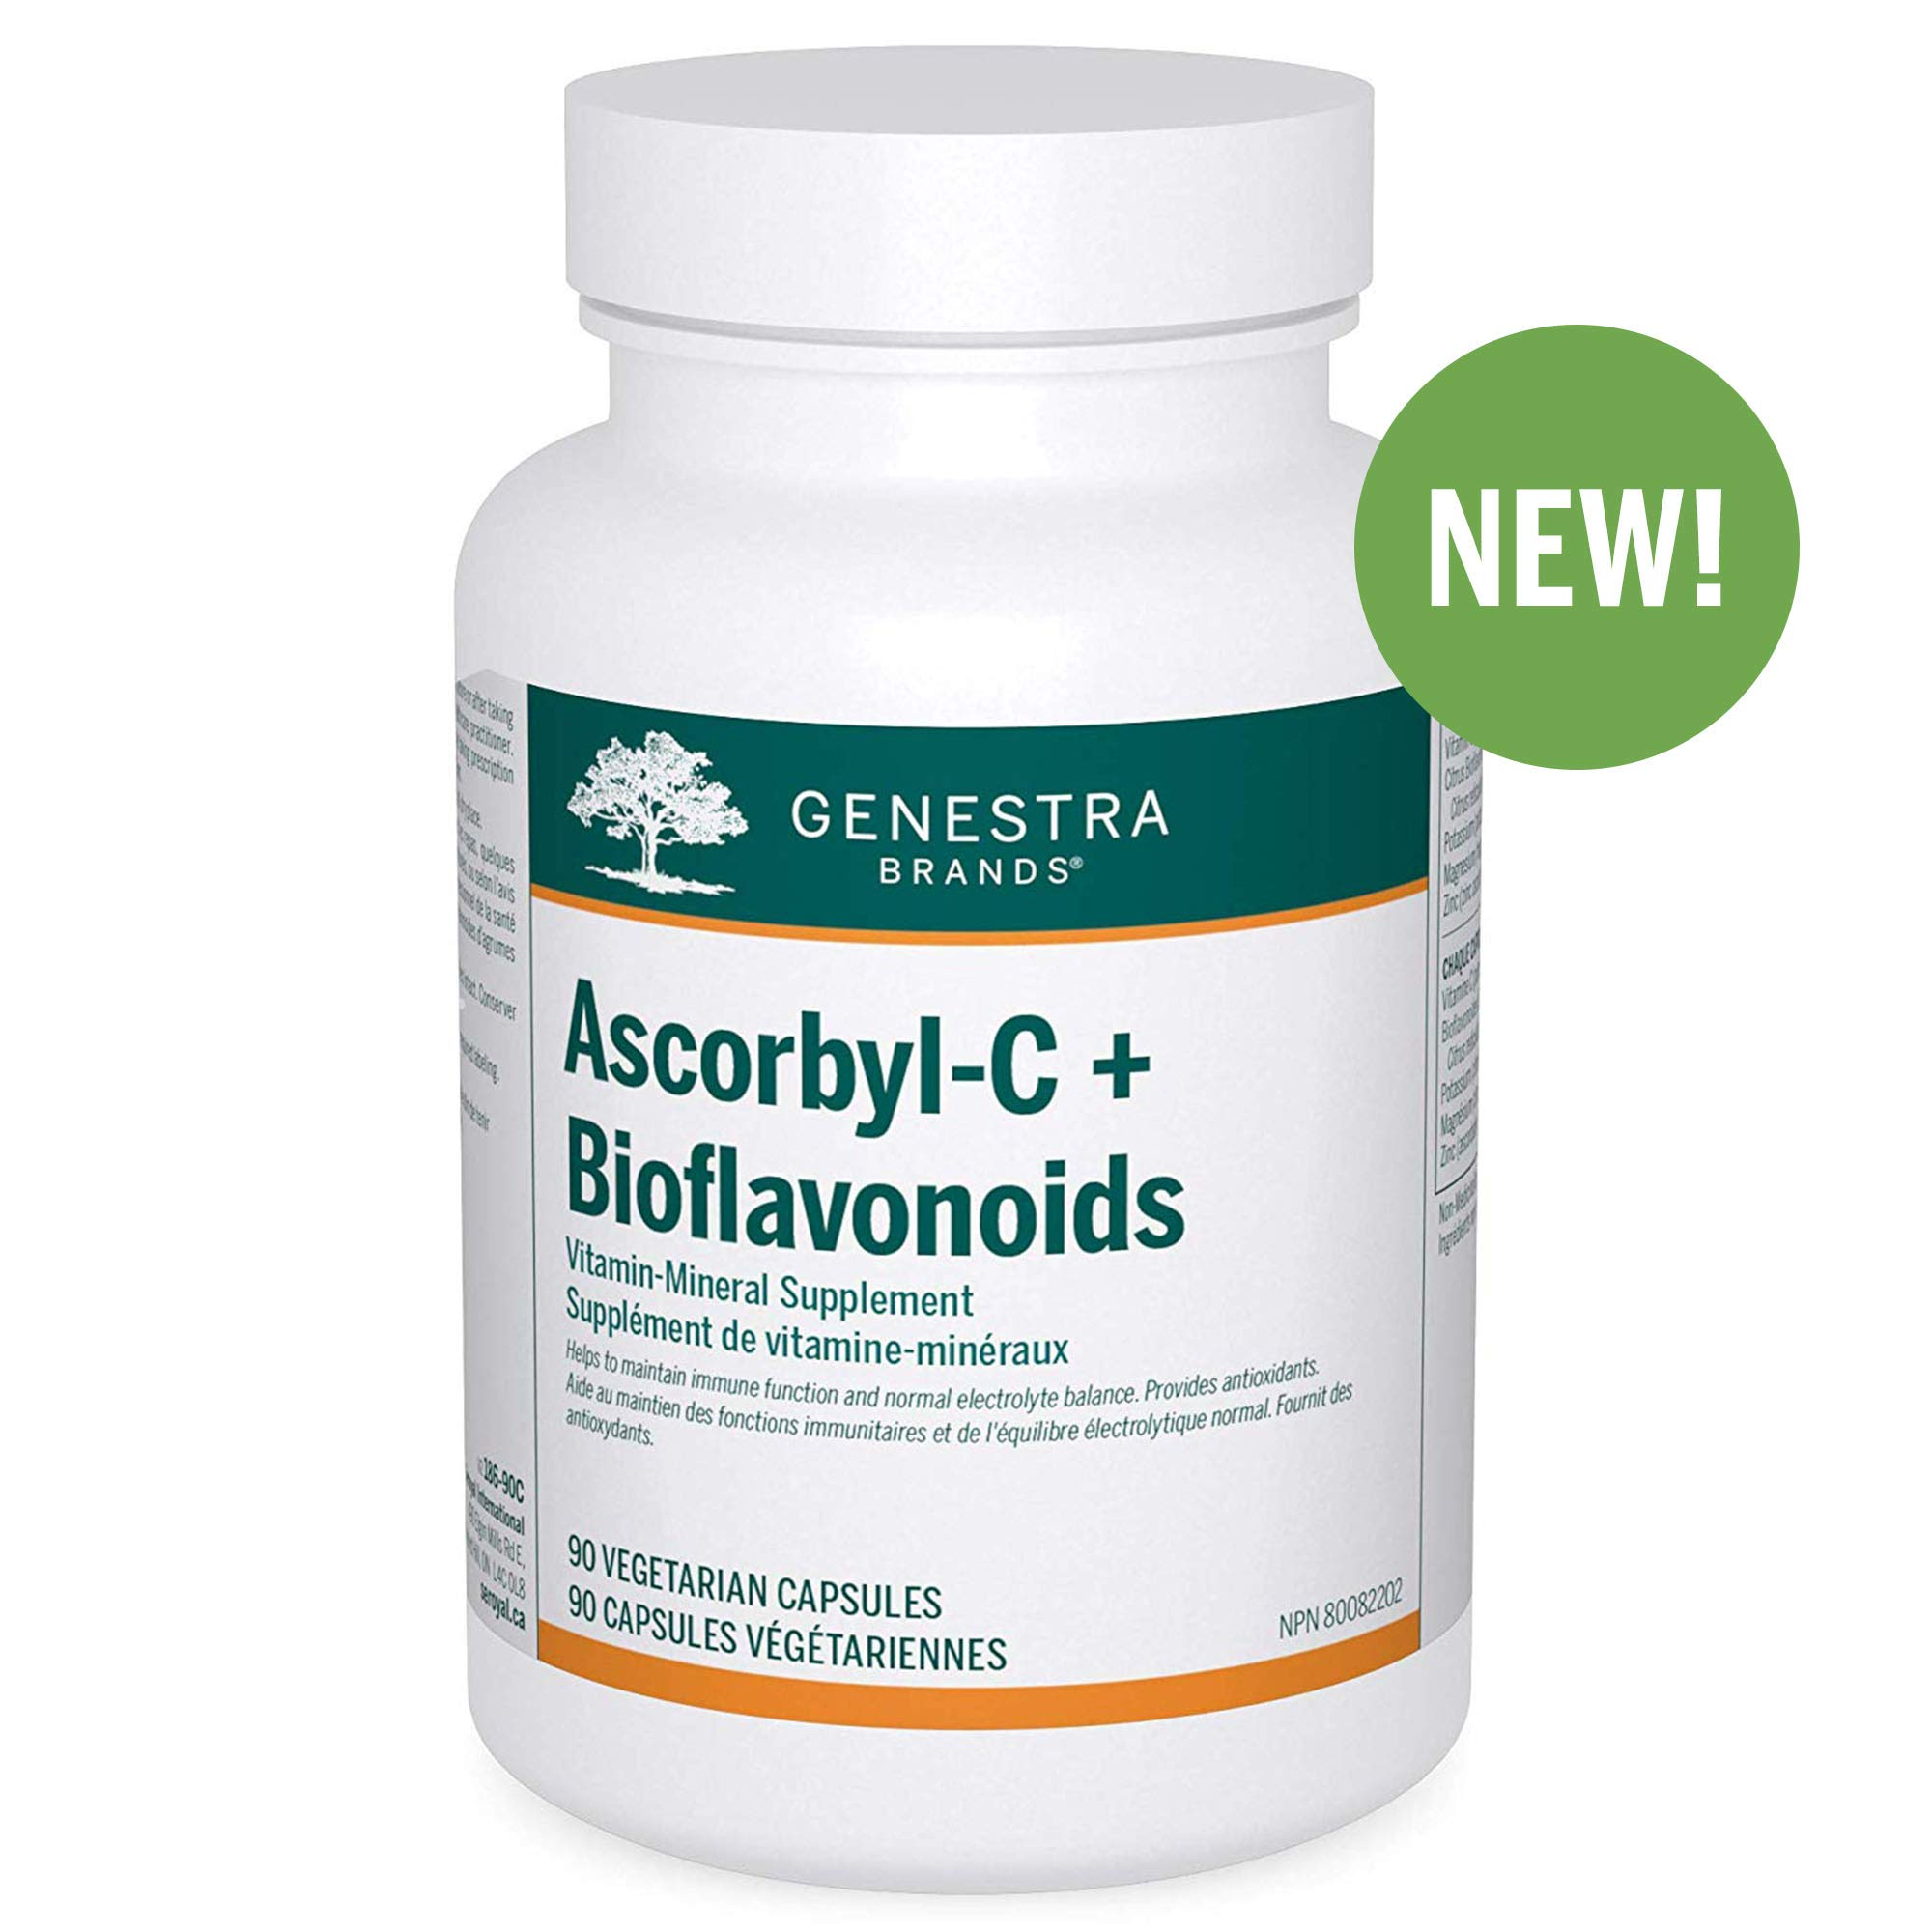 Genestra Brands - Ascorbyl-C + Bioflavonoids - Vitamin-Mineral Supplement - 90 Vegetarian Capsules